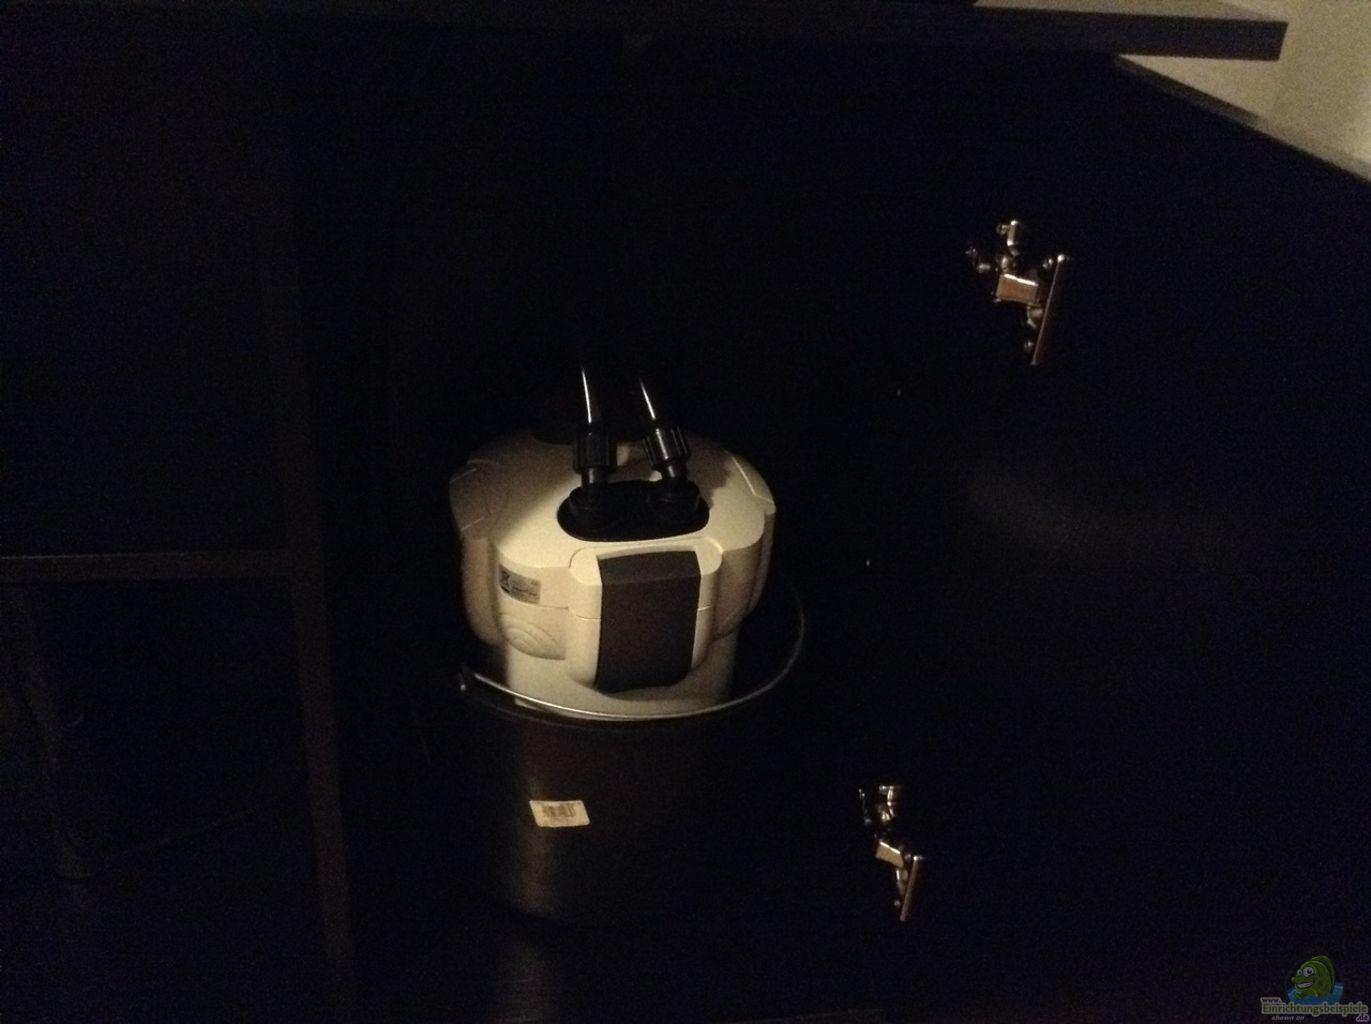 sunsun au enfilter aus wurzel biotop ohne heizung von simon w. Black Bedroom Furniture Sets. Home Design Ideas